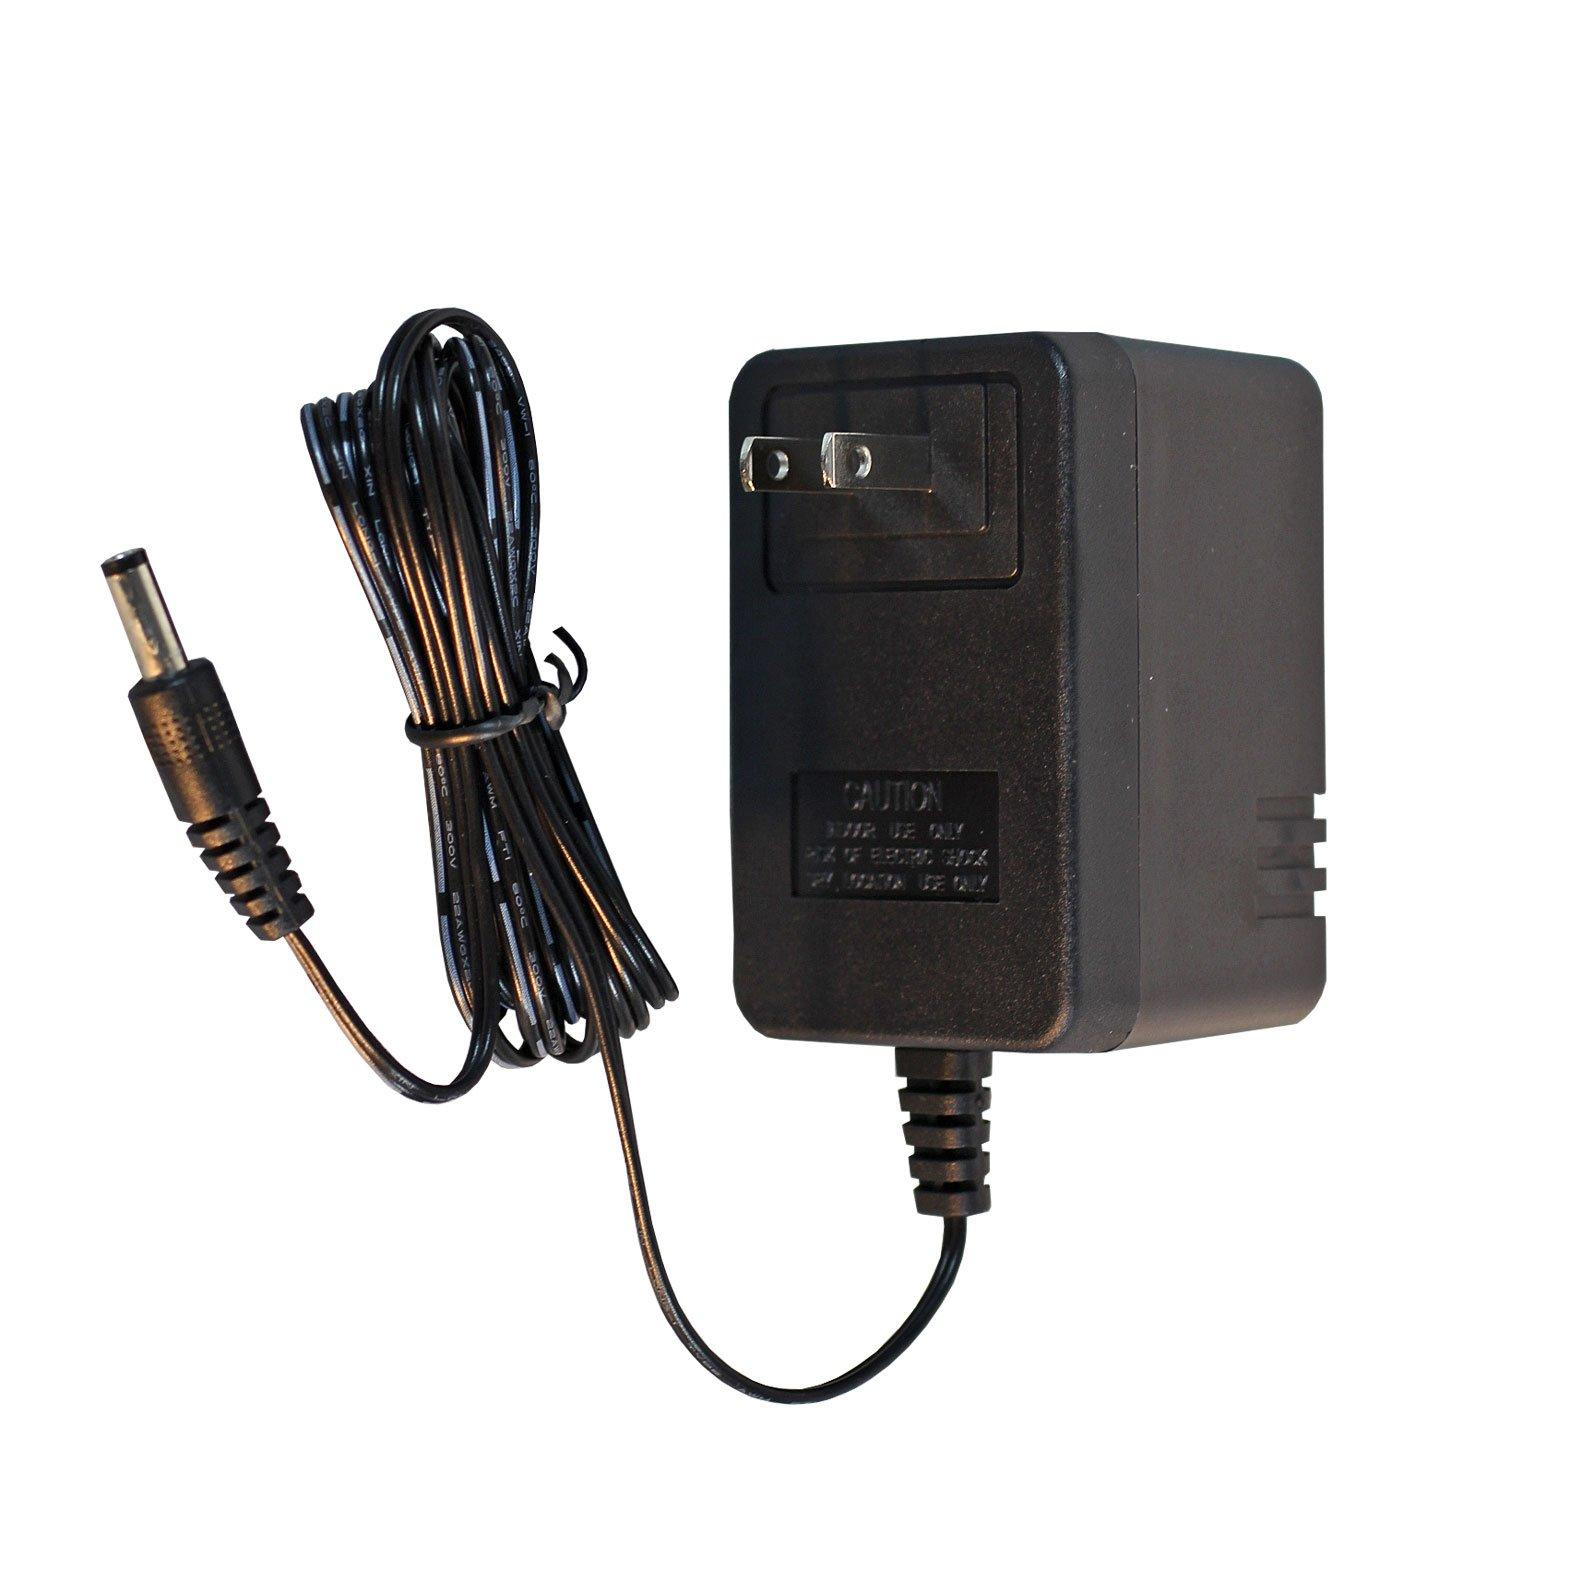 Booster Pac Es2500 Ac Charger Batterymart Com